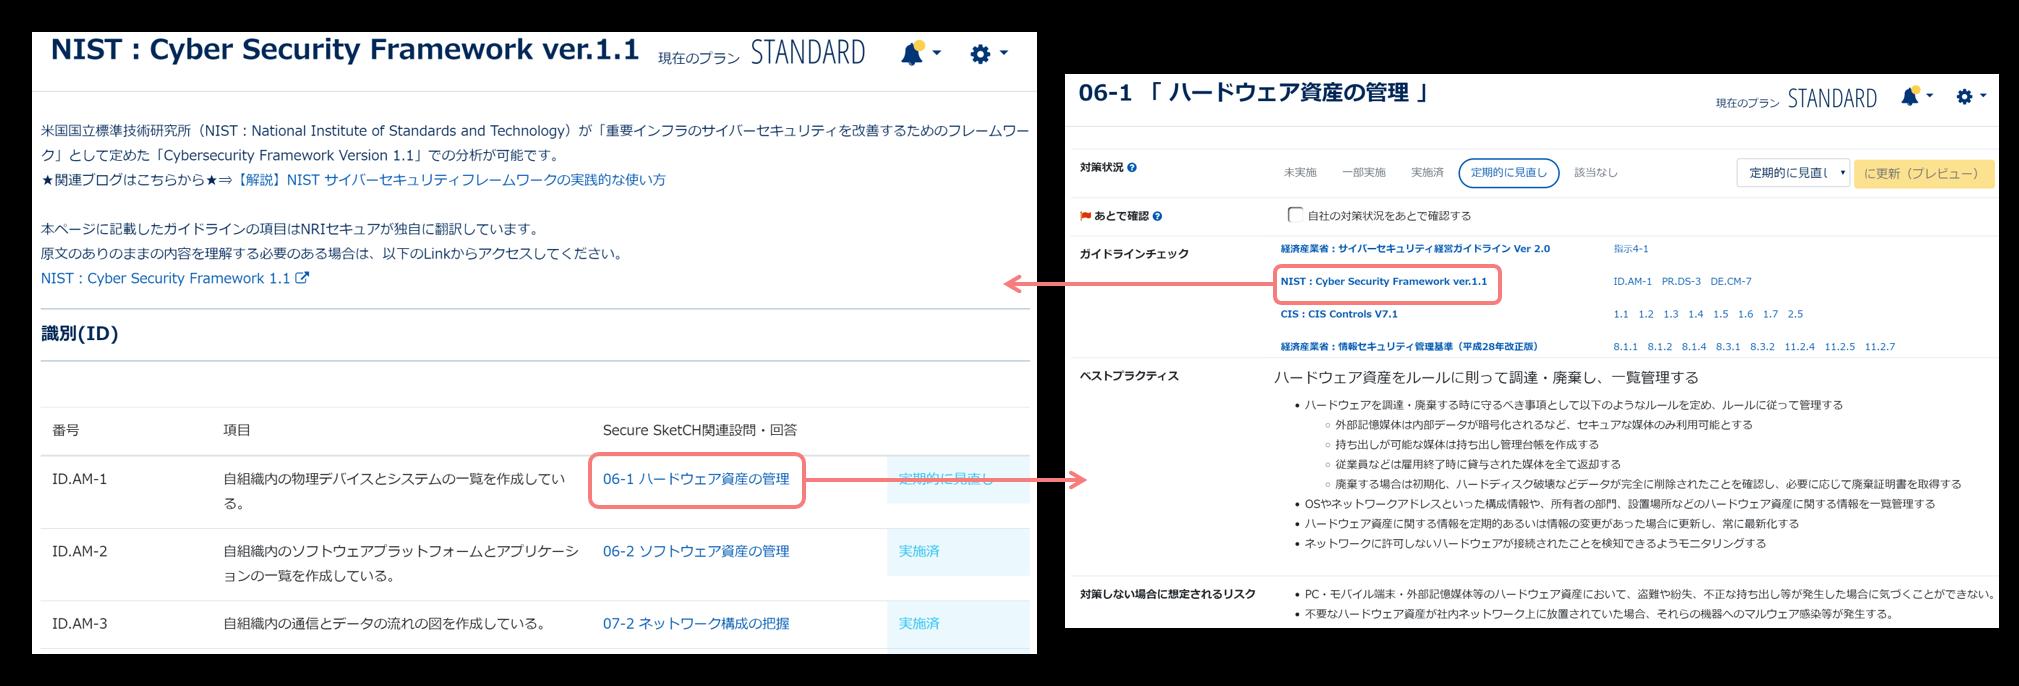 Secure SketCH_ガイドラインチェック